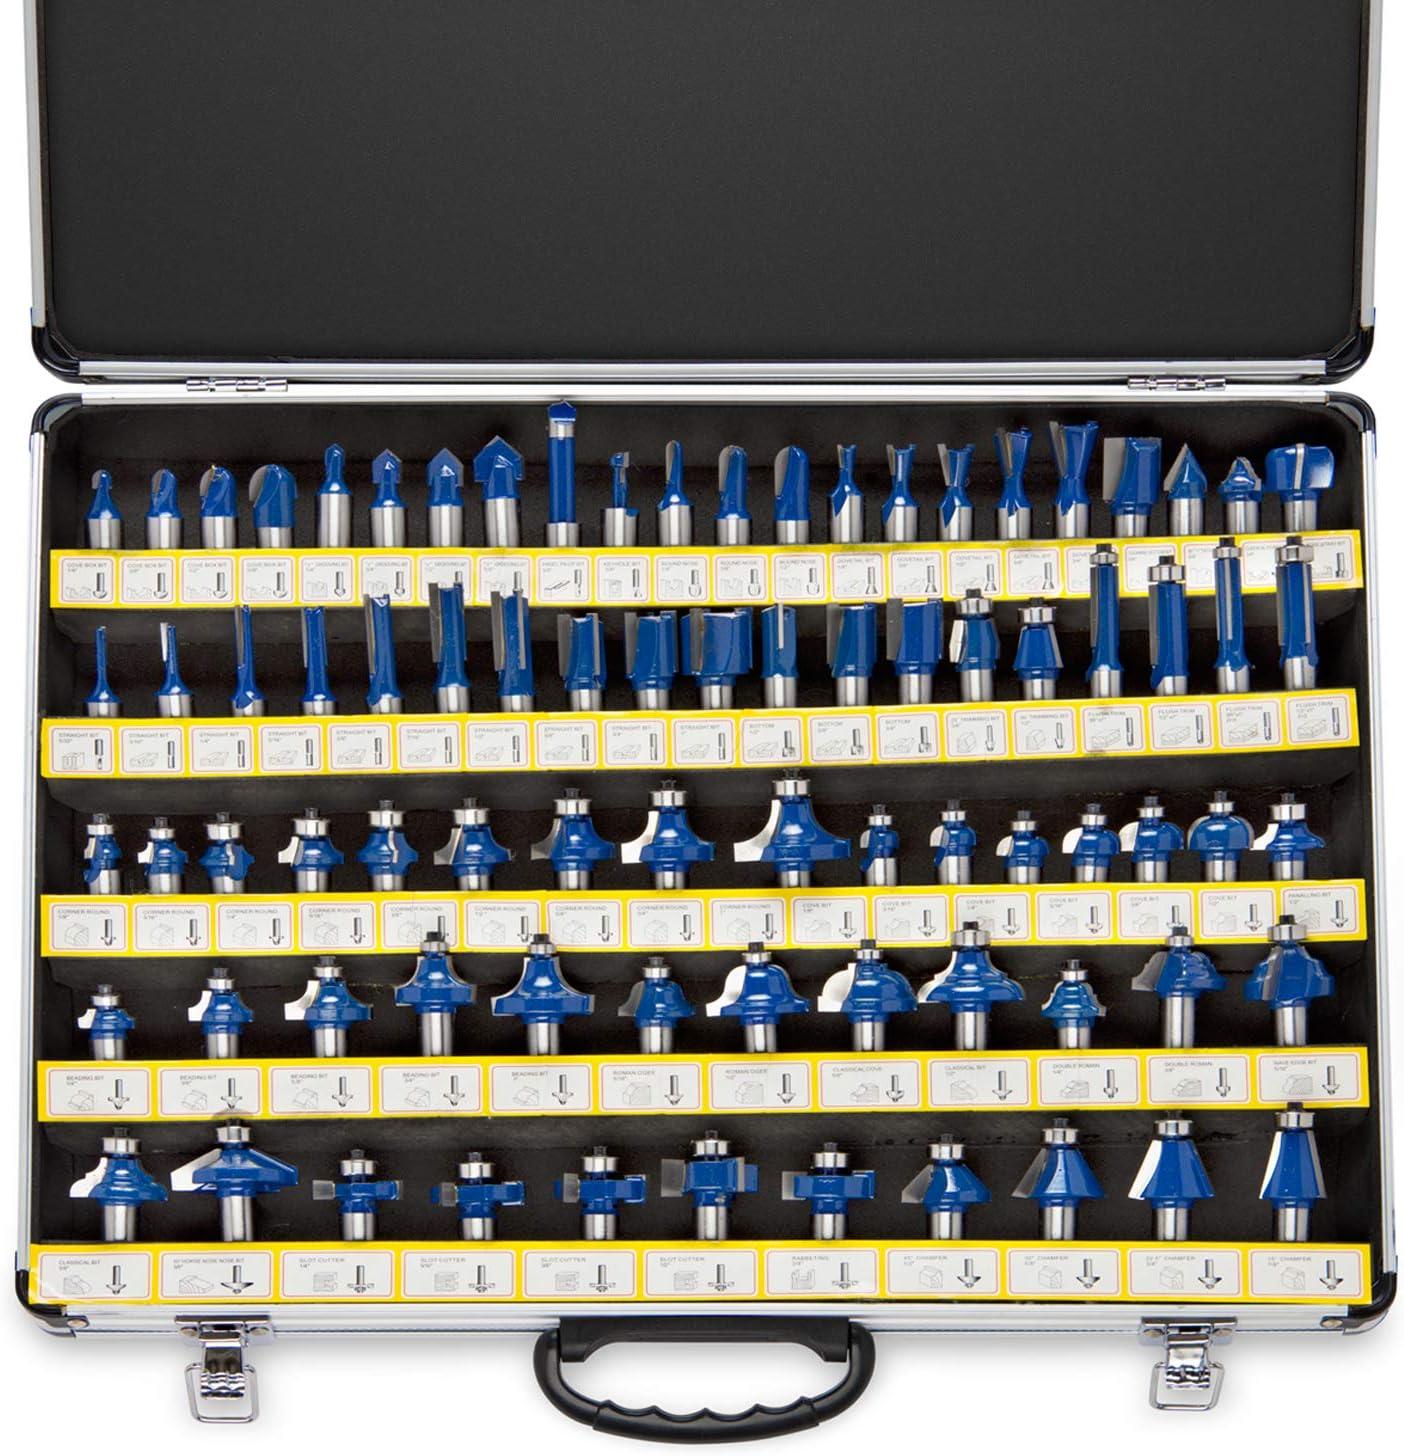 7. Neiko 10115A Premium Tungsten Carbide Router Bits 80-Piece Set